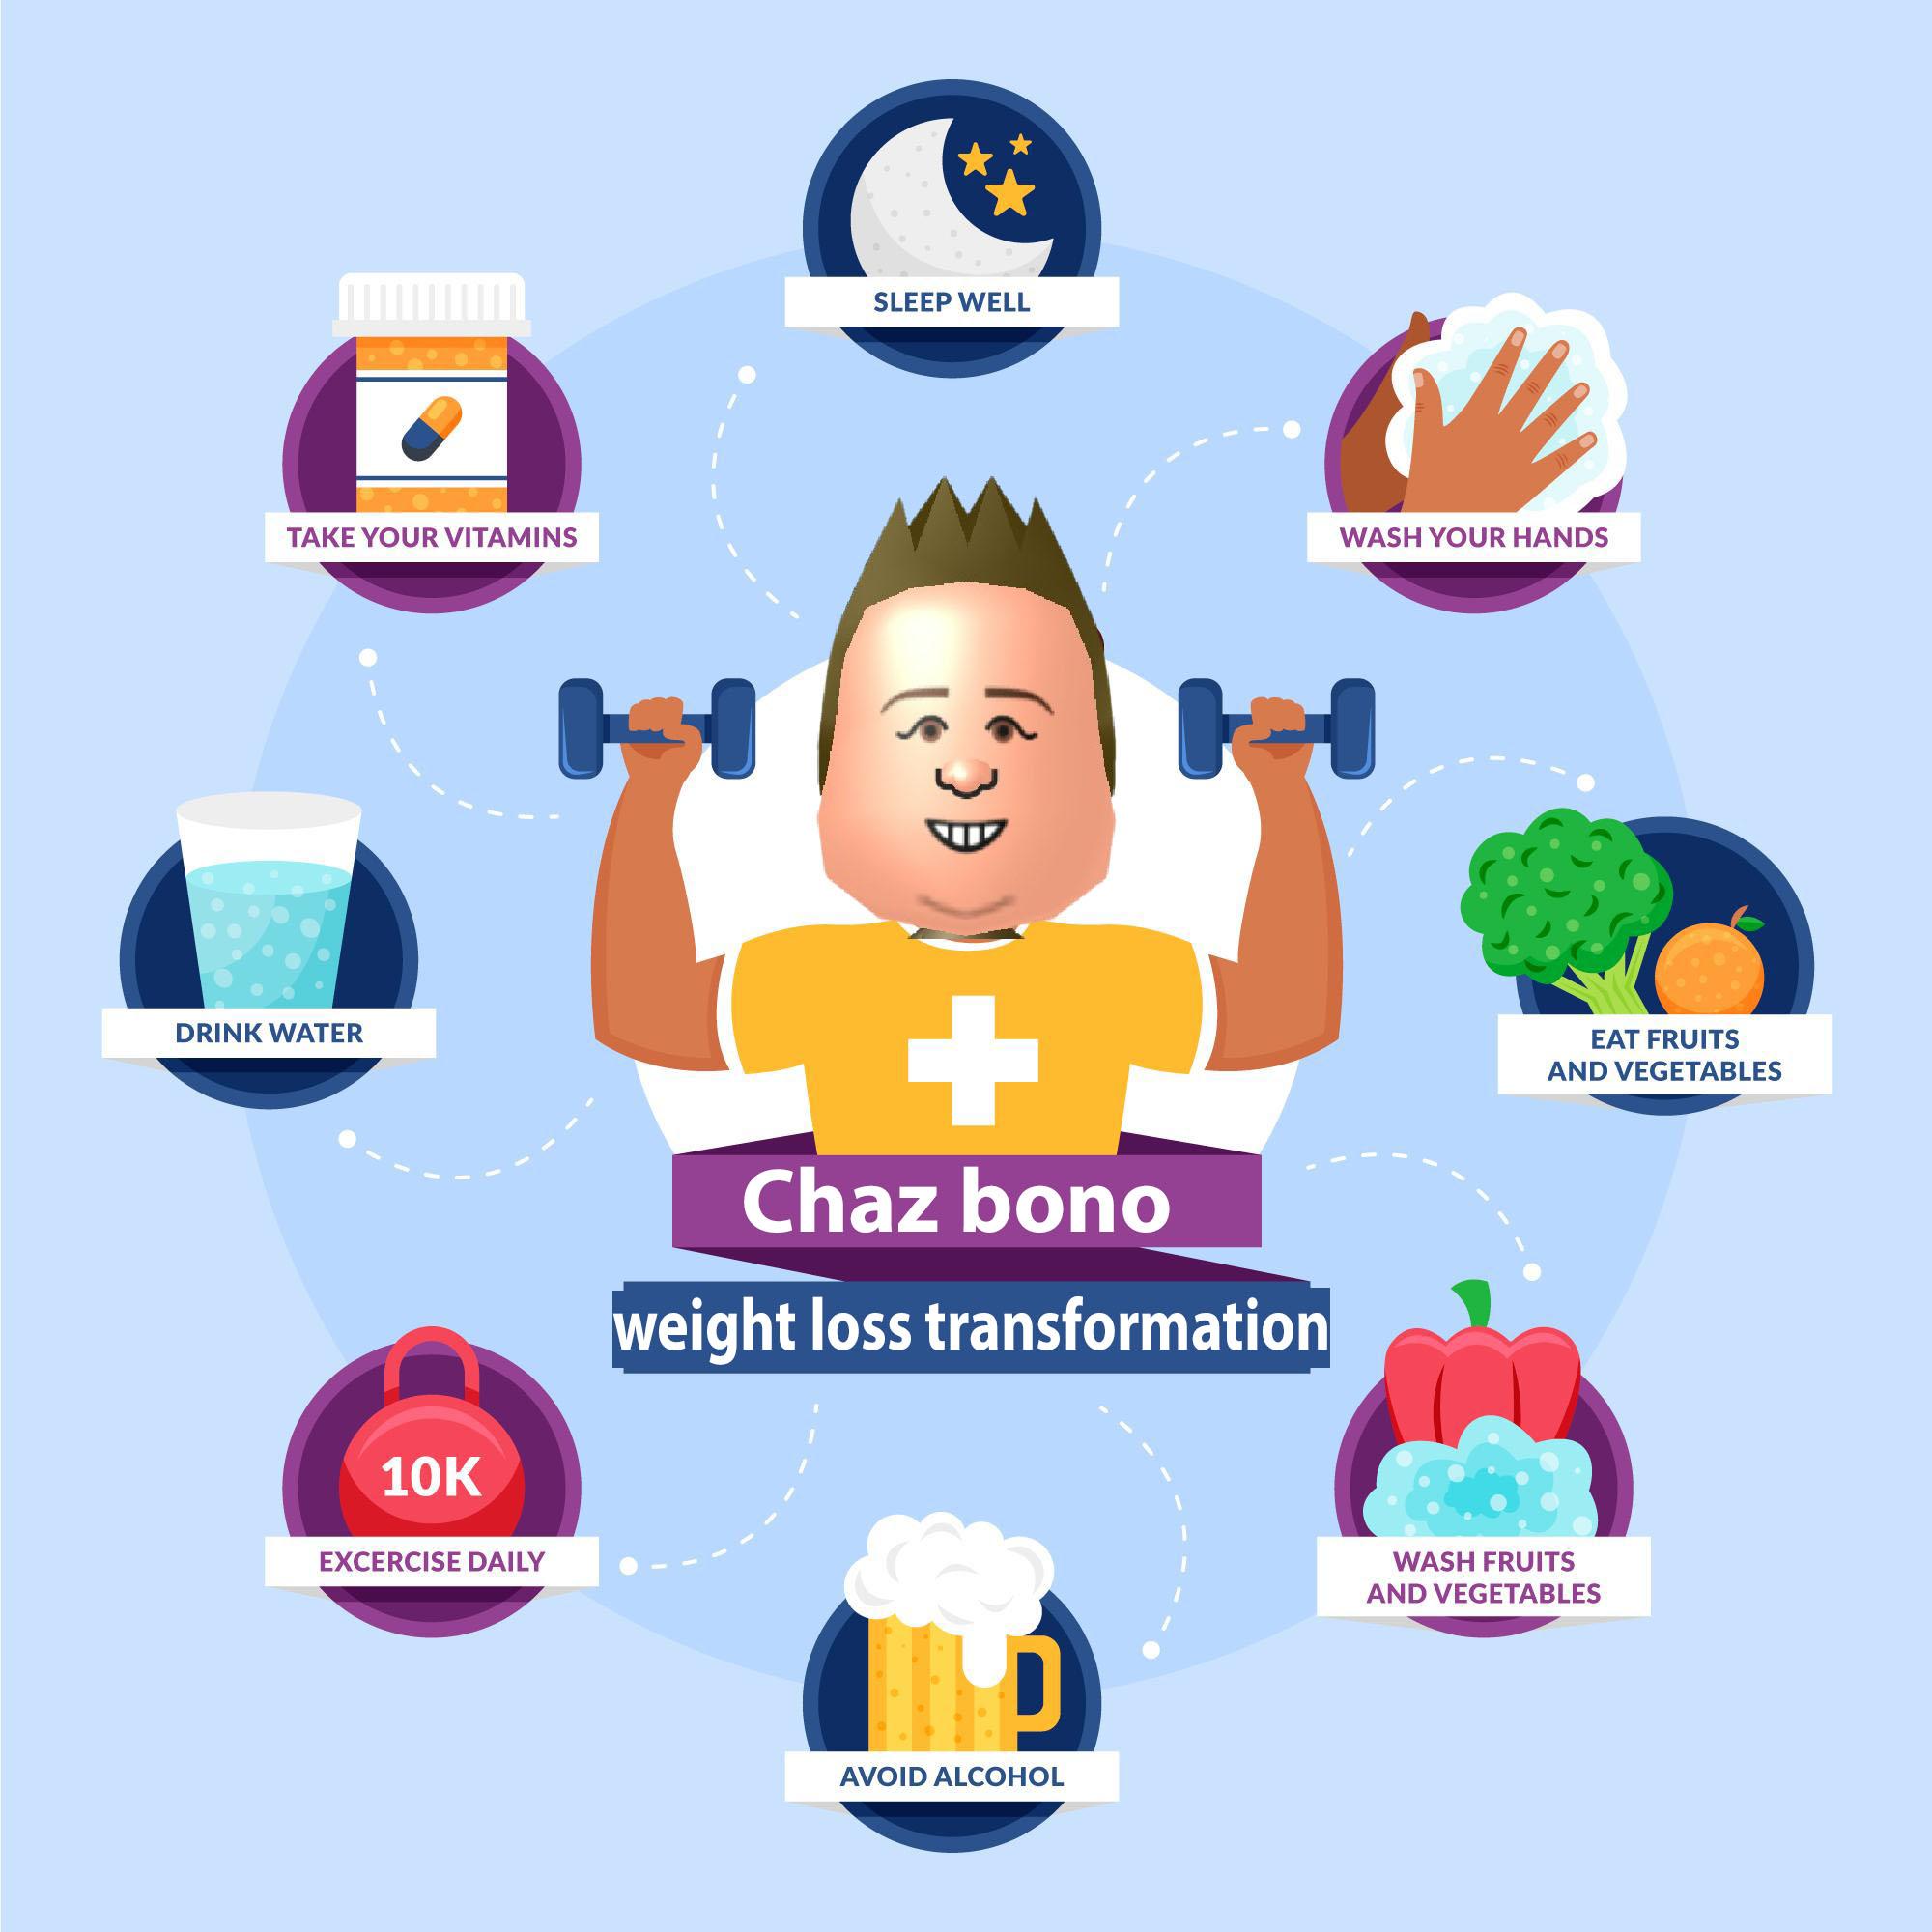 chaz bono pierdere în greutate 2021